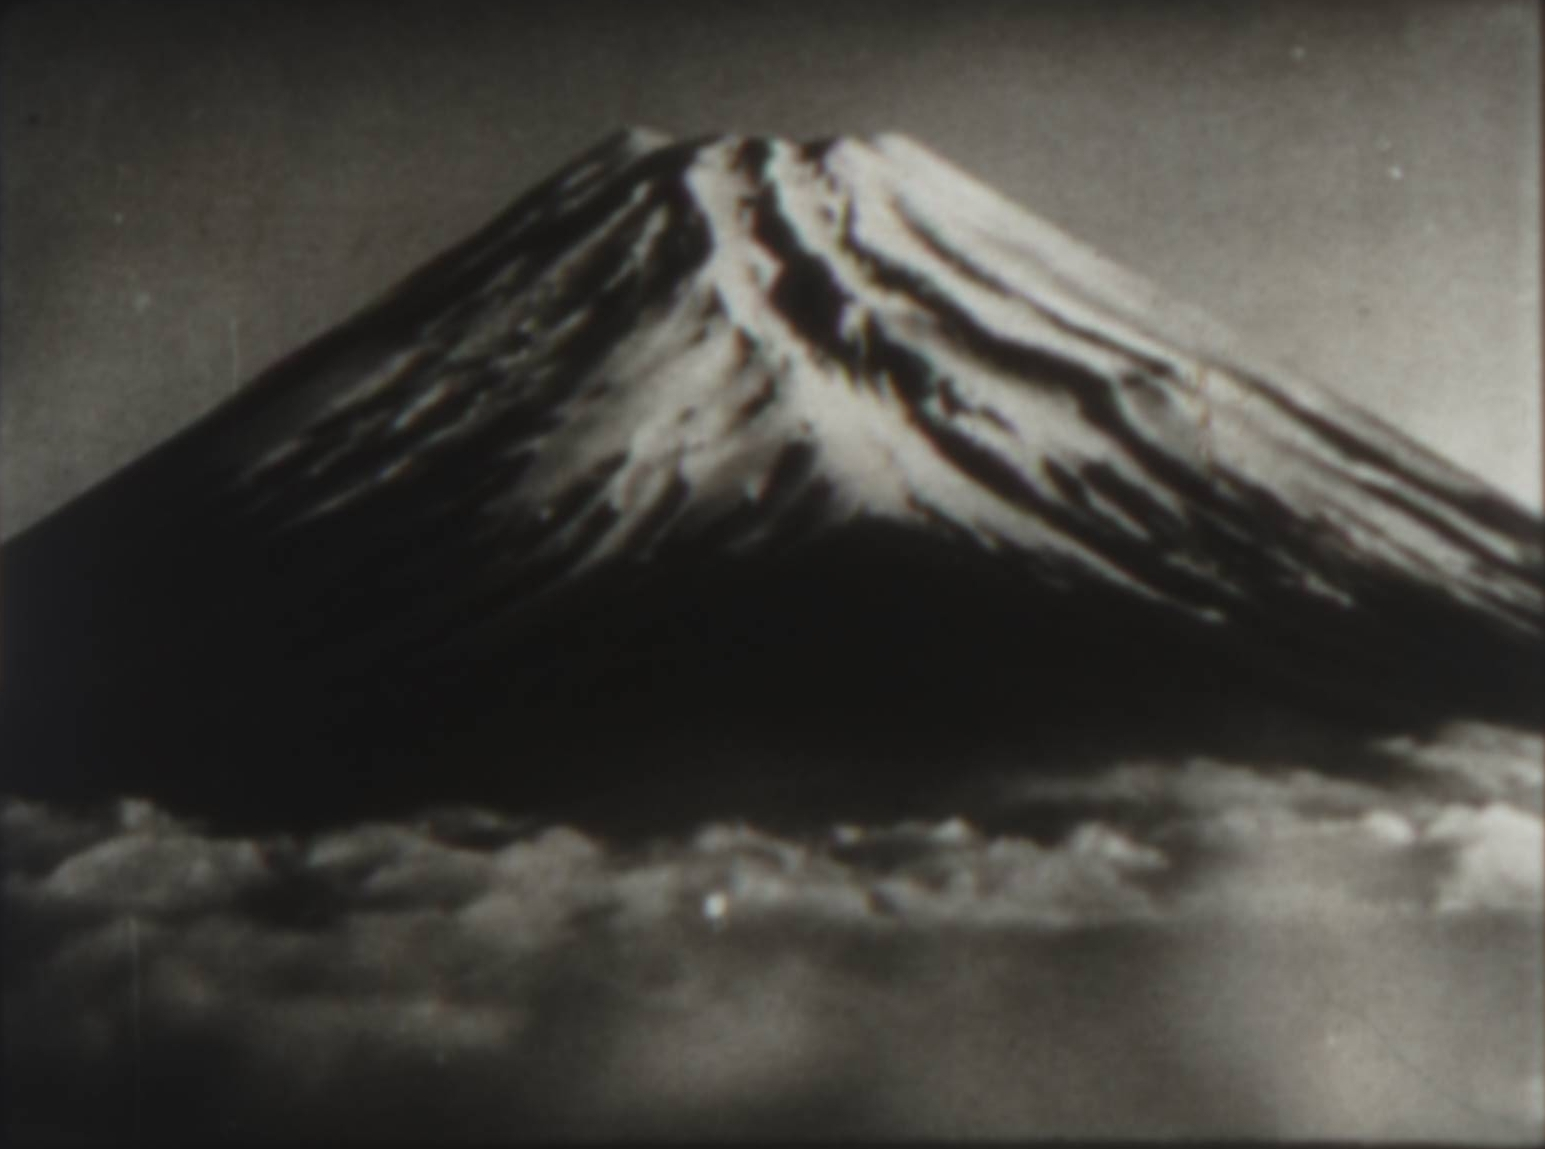 日本映画史00 - 松竹ロゴ